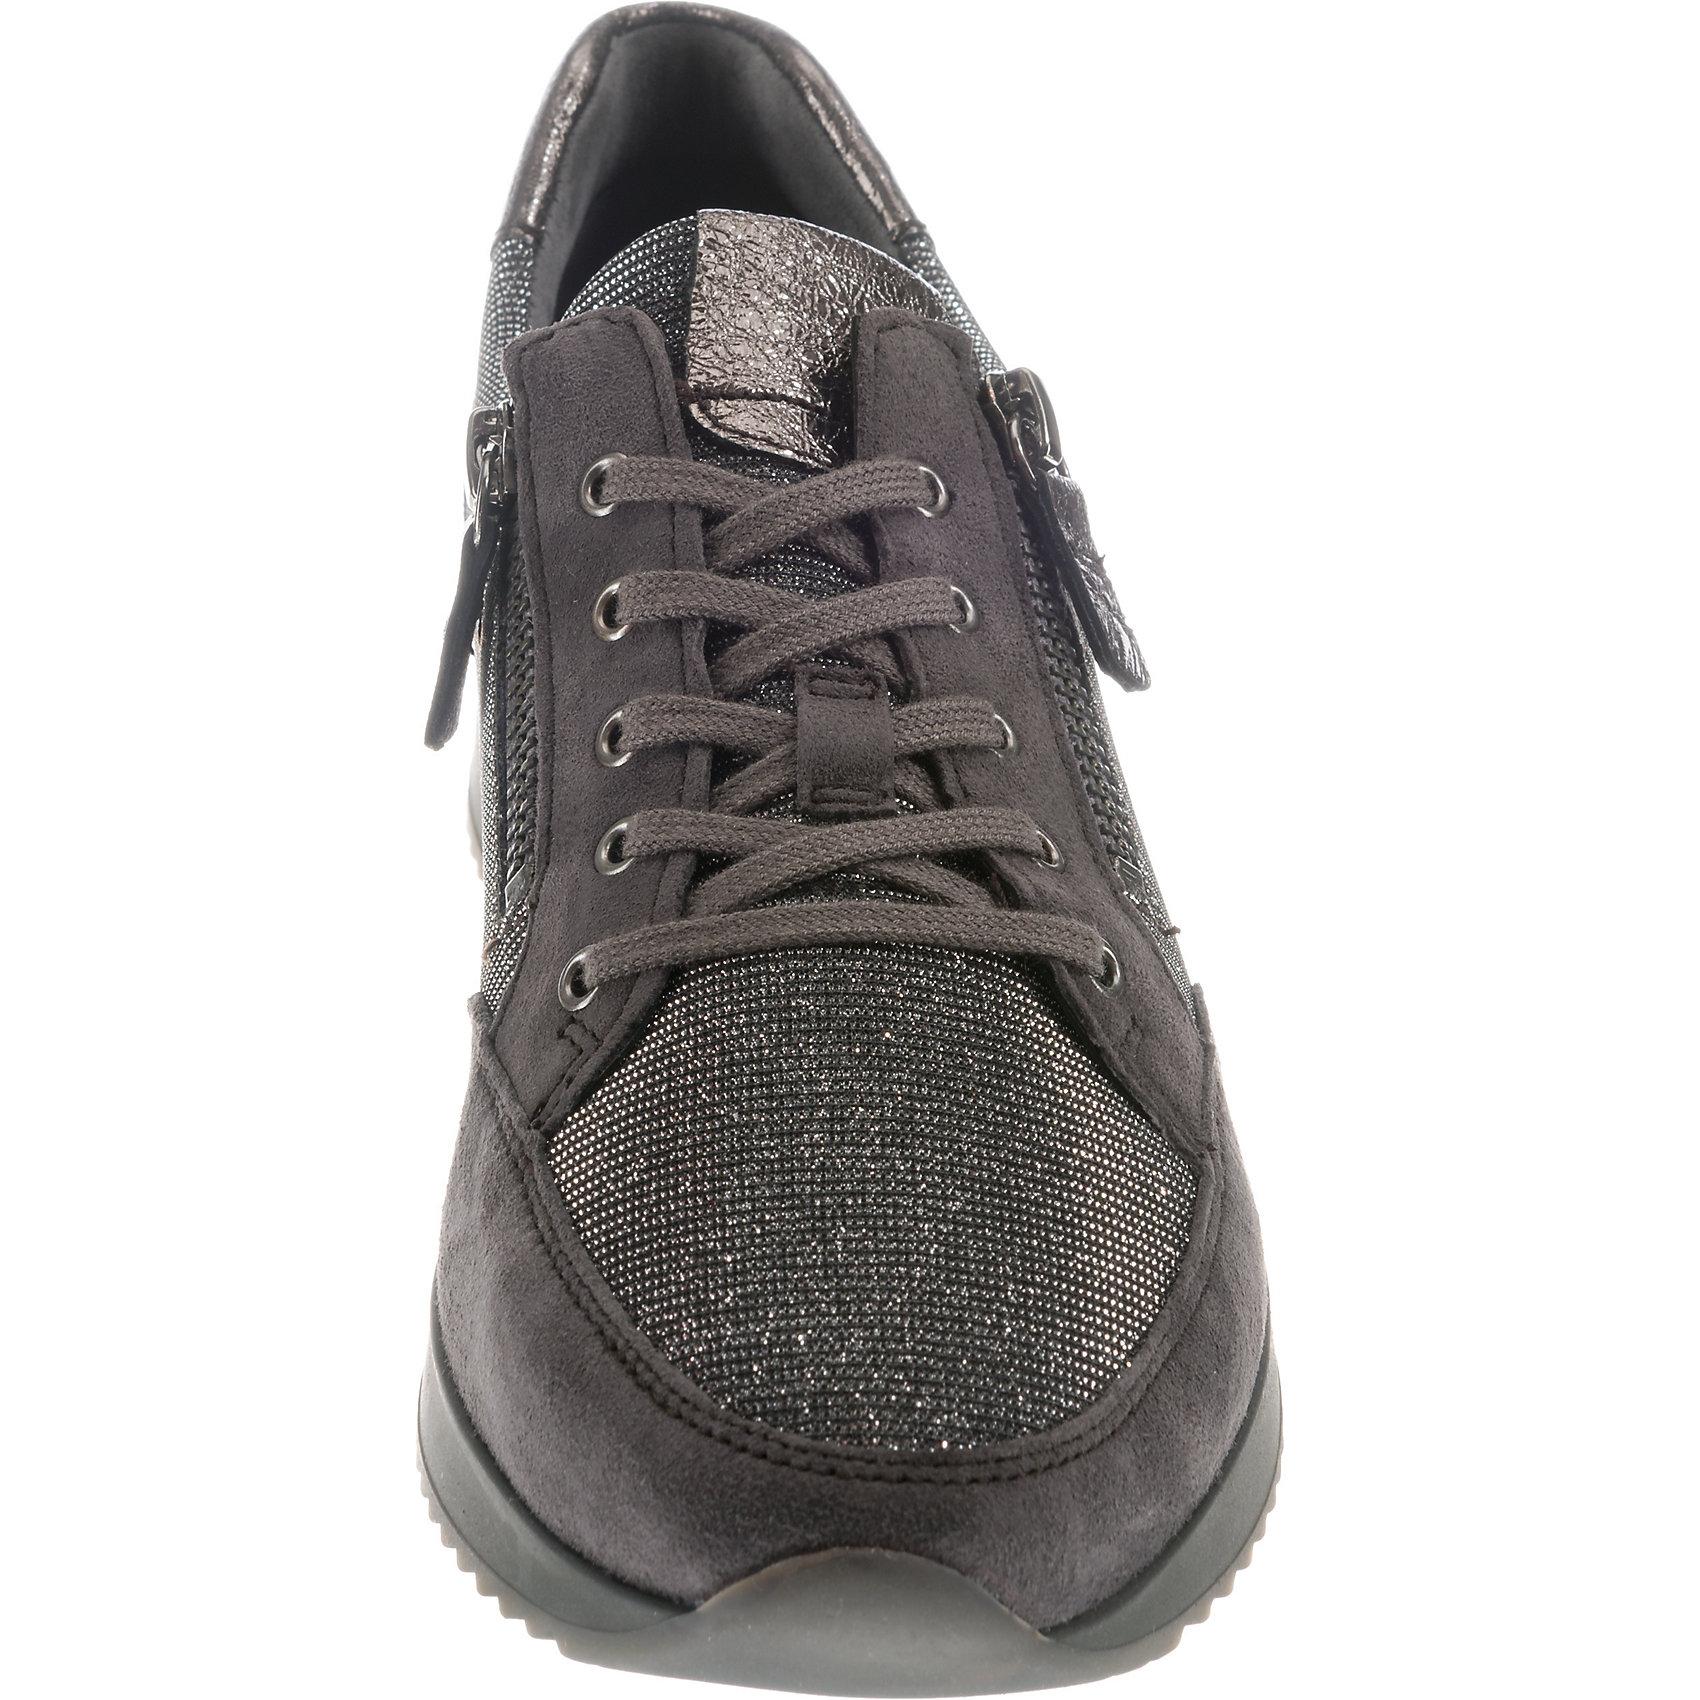 Grau Für Neu Gabor Sneakers Damen 8780950 eH29YDEIW